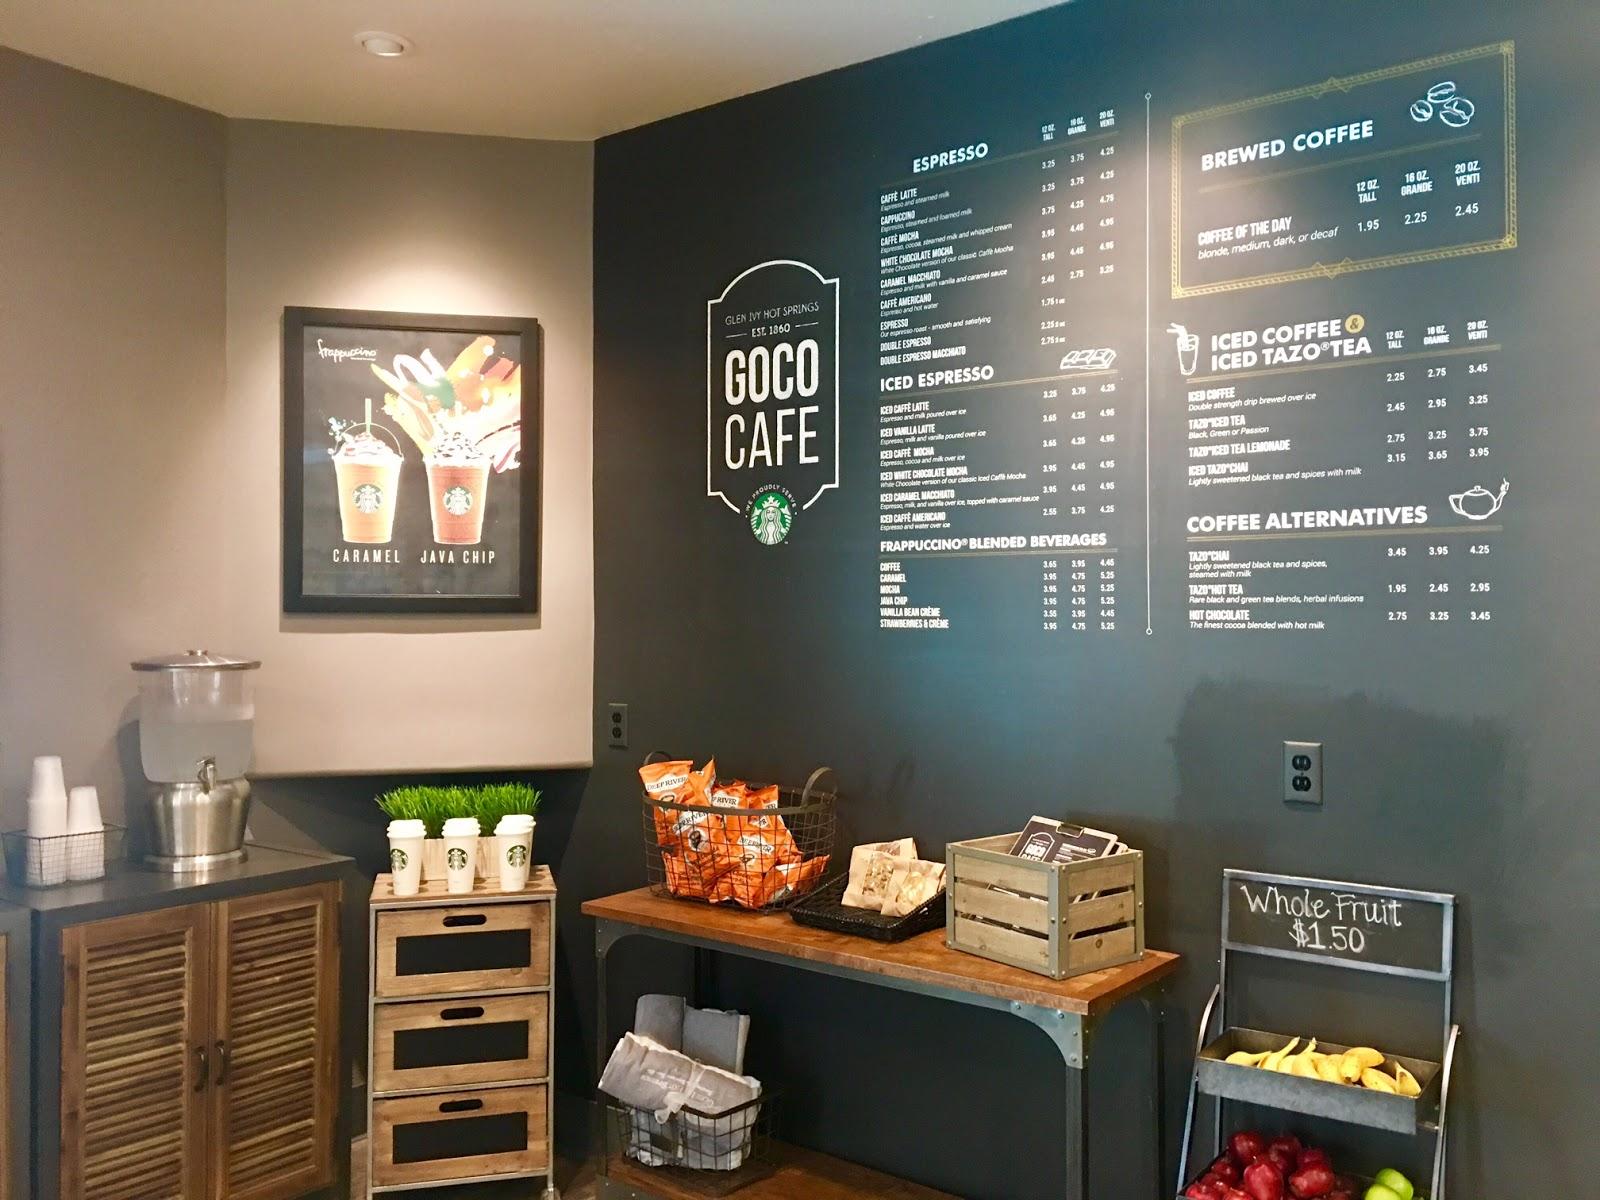 Glen Ivy Coco Cafe